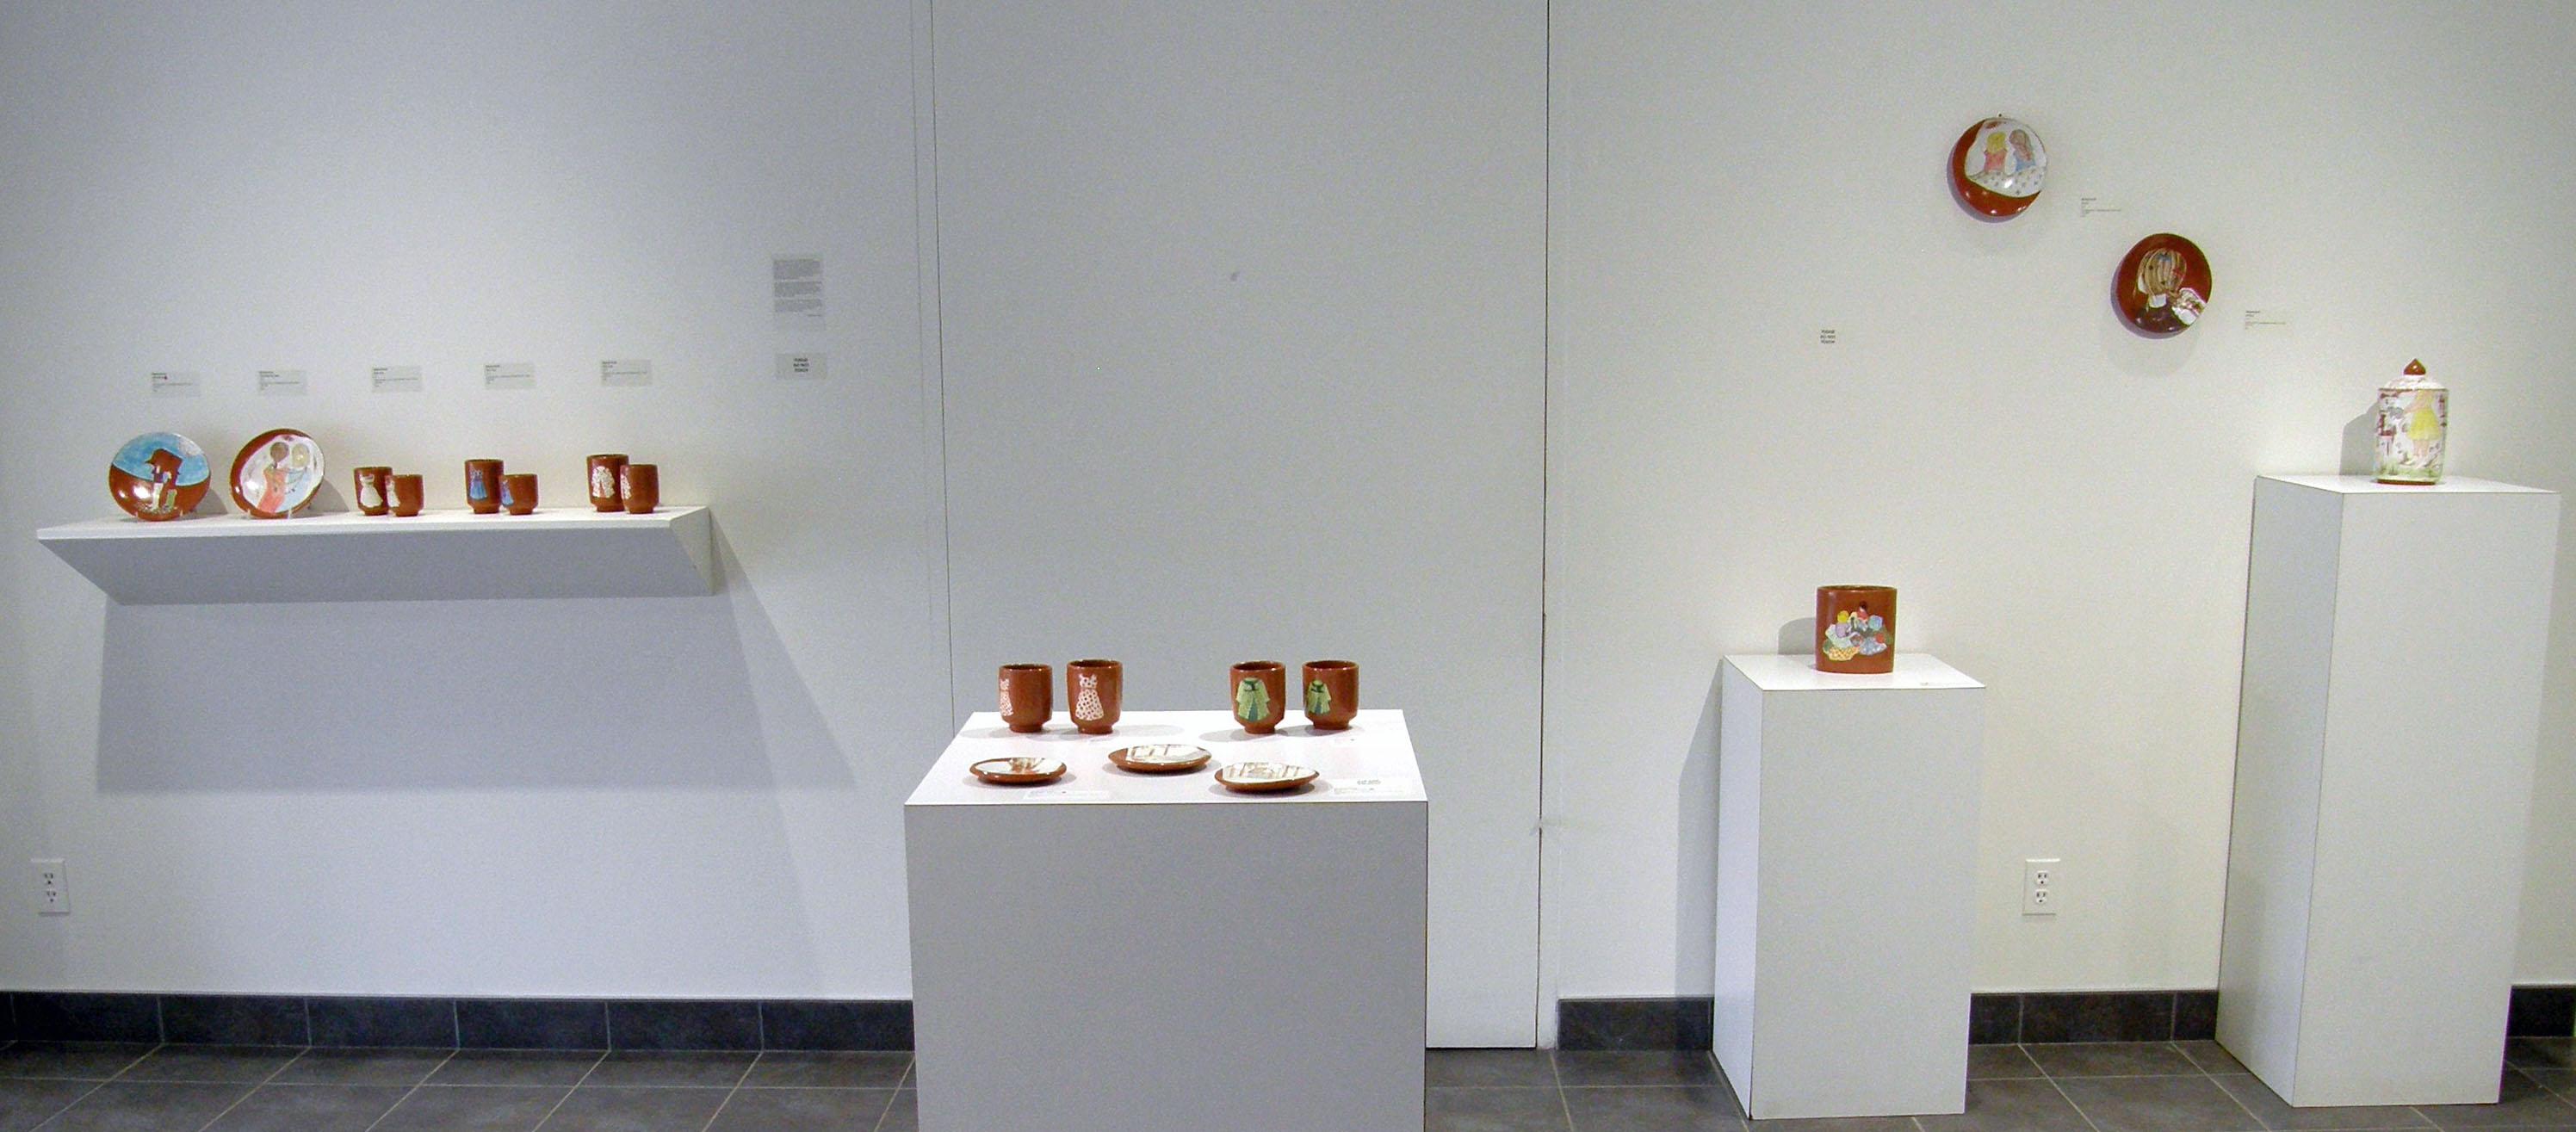 How to write an Exhibition Proposal | Saskatchewan Craft Council